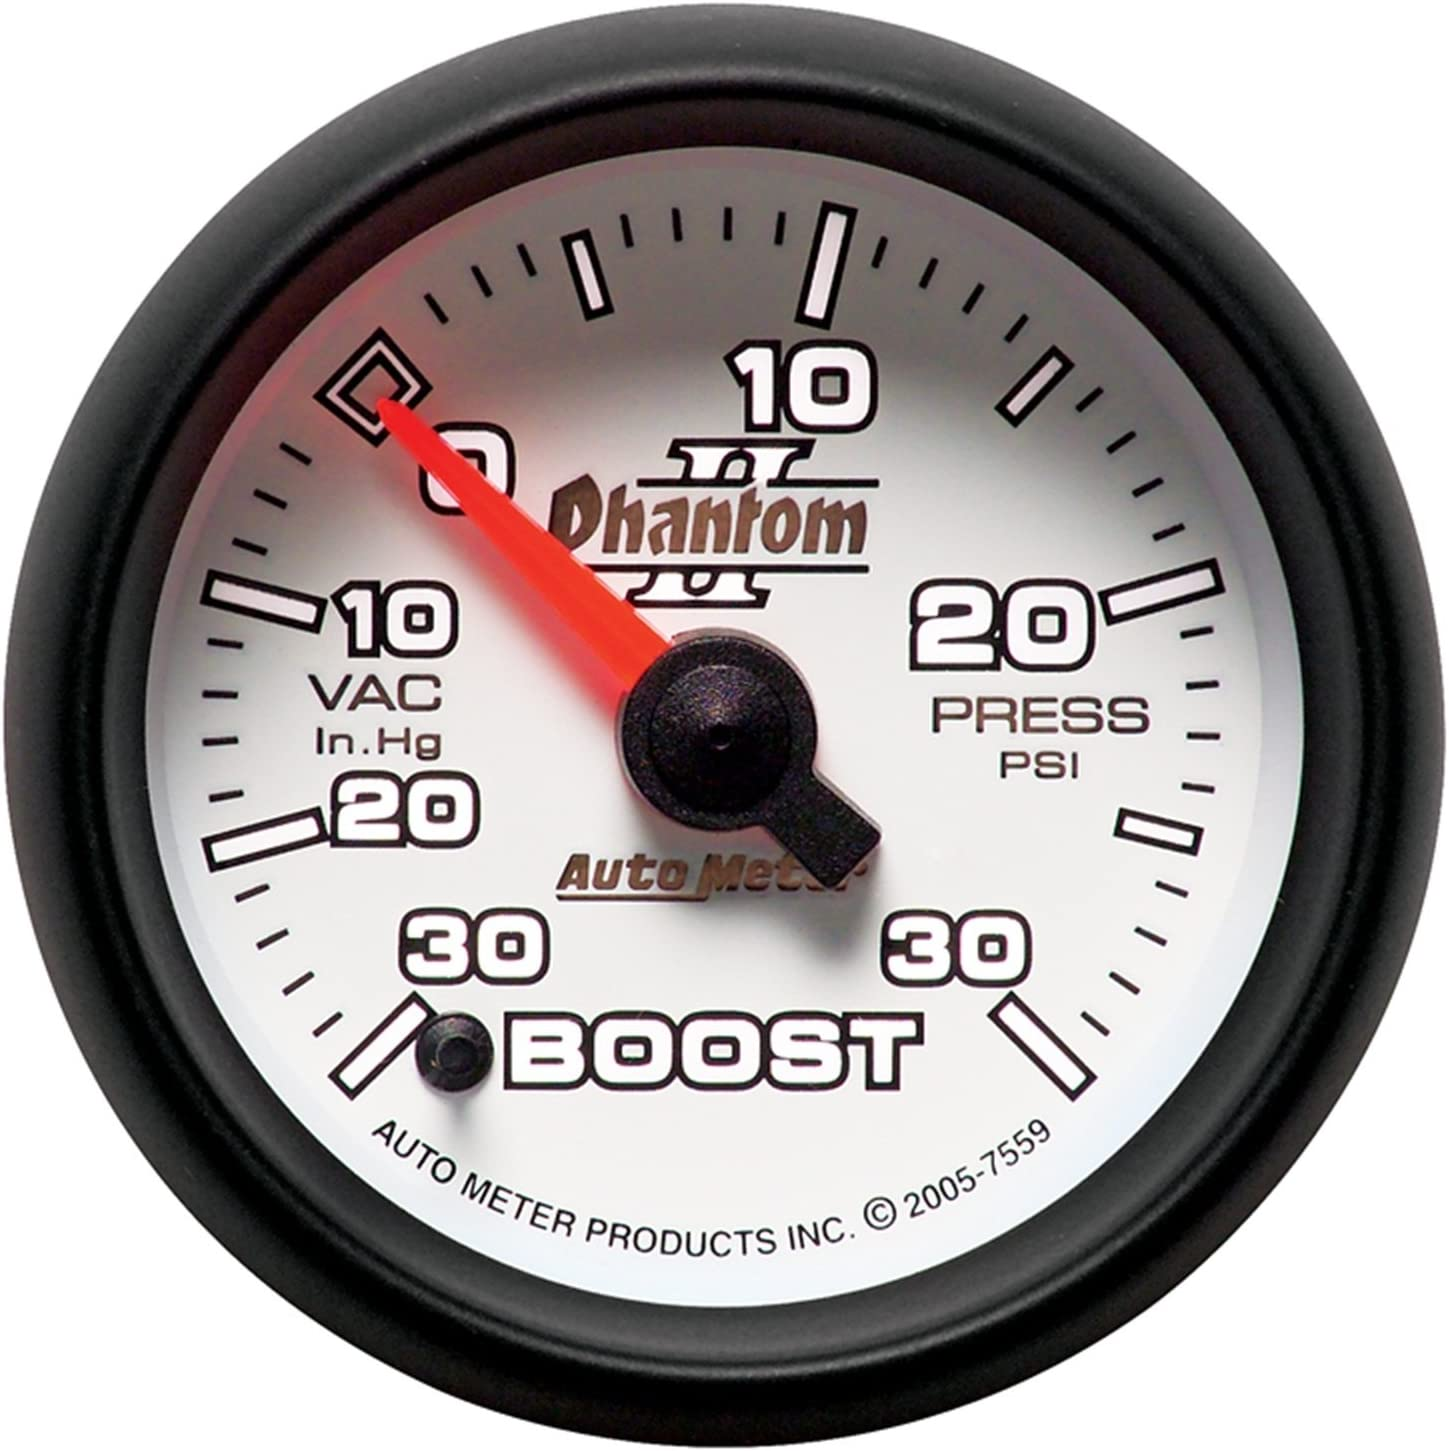 Auto Meter 7559 Phantom II Full Sweep Electric Vaccum Boost Gauge